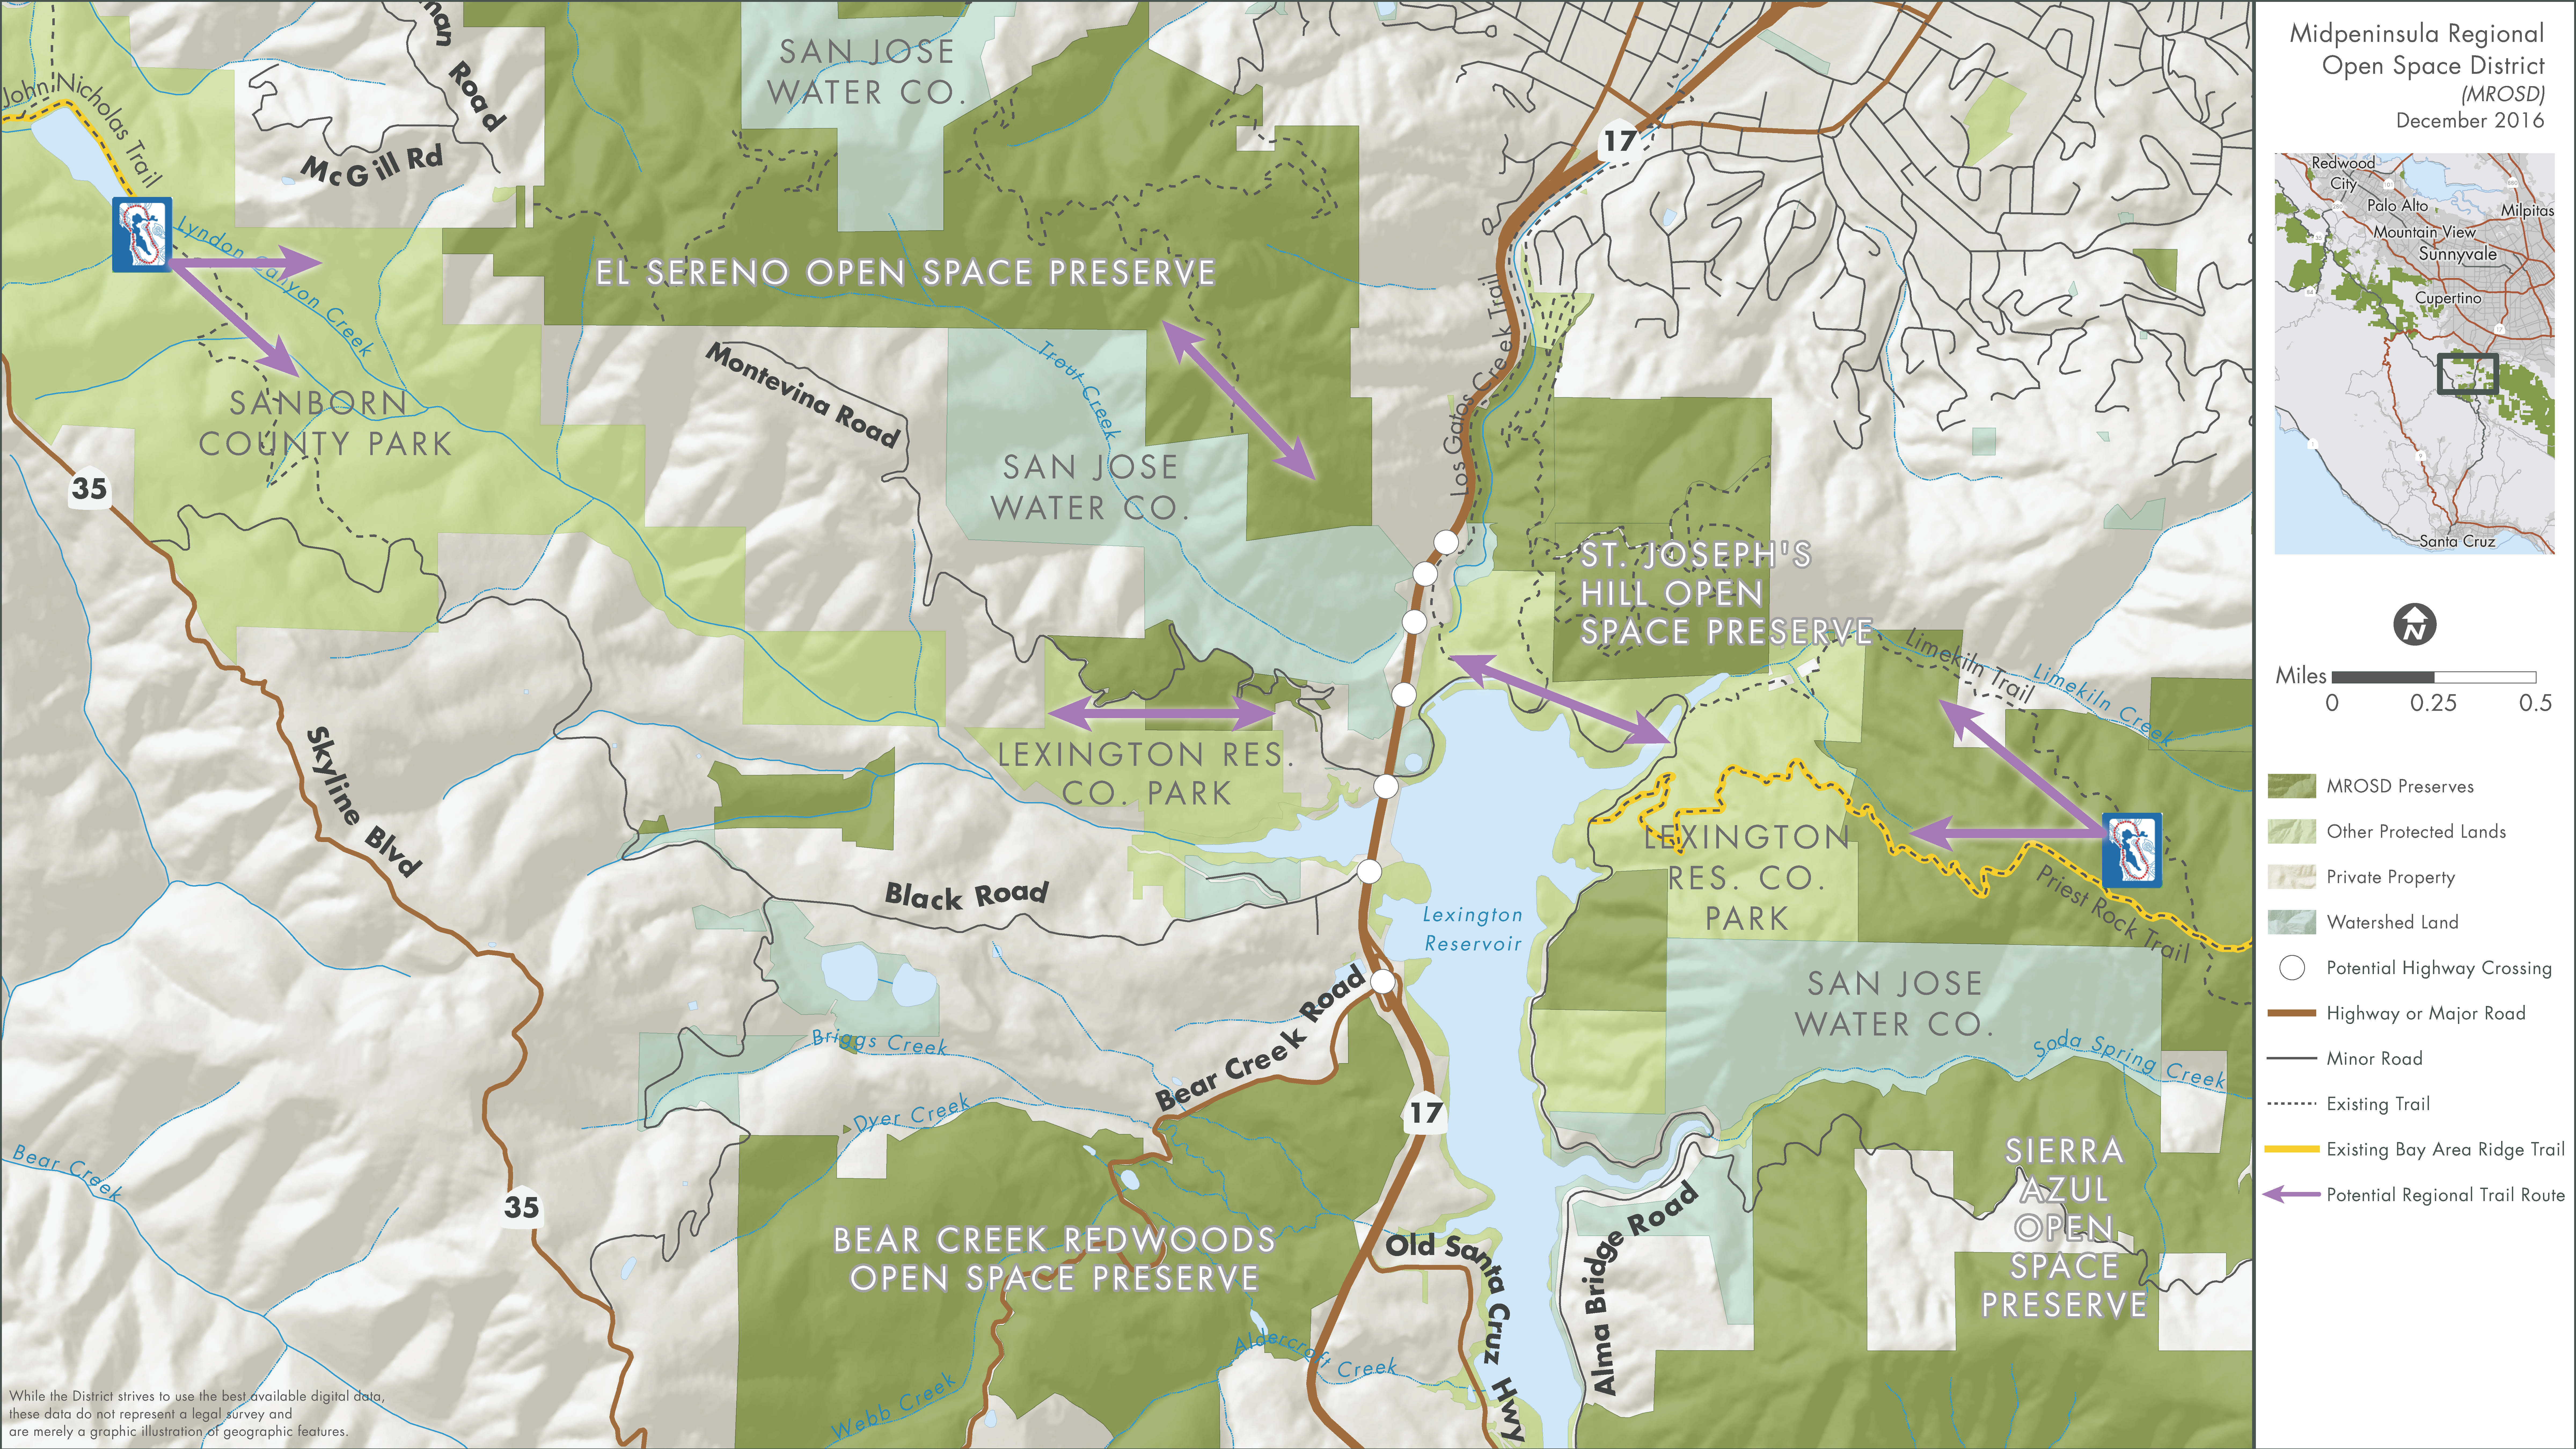 Hwy 17 Crossing Alternatives Map